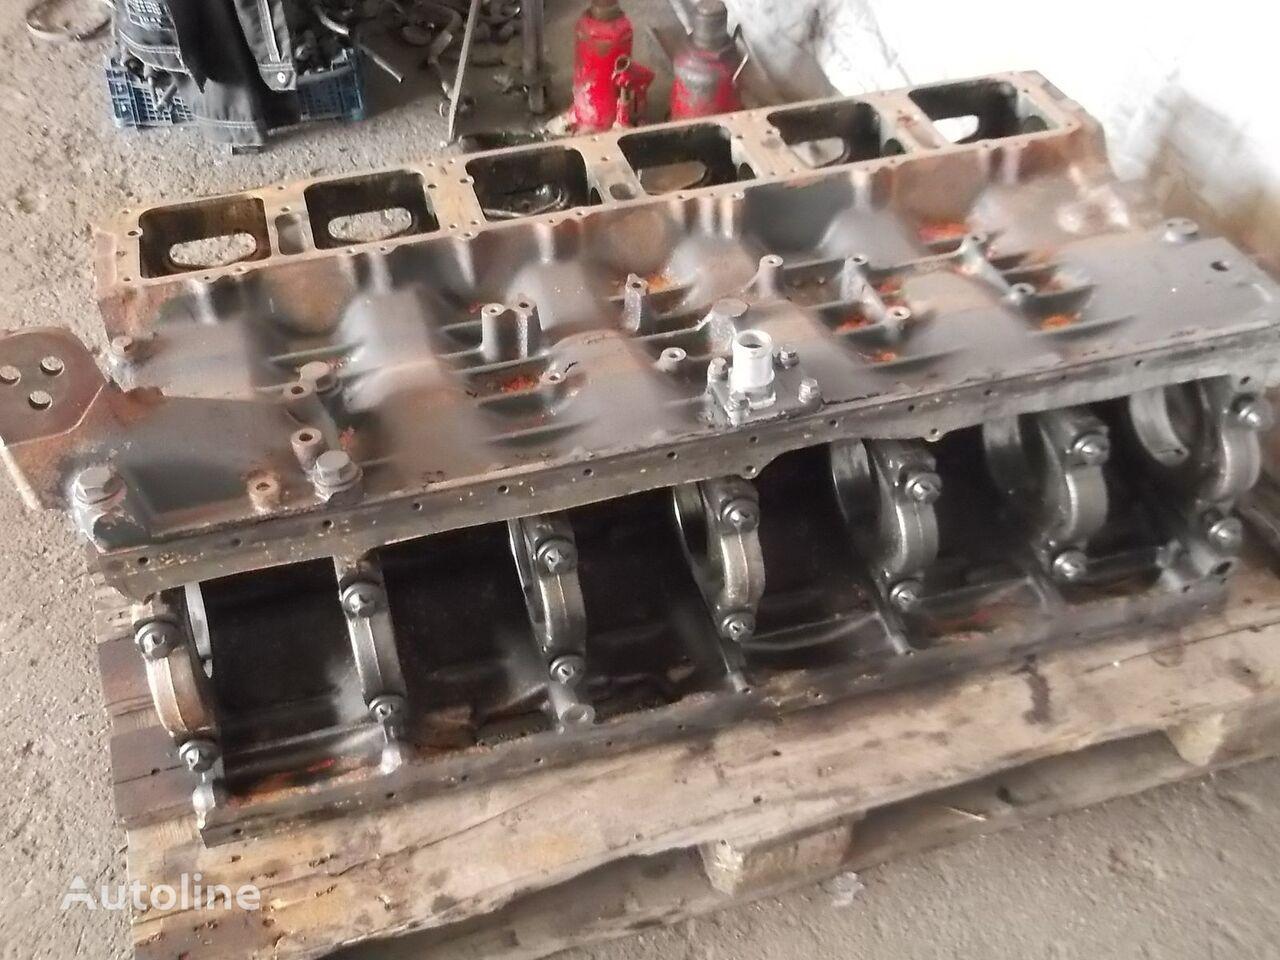 bloc moteur SCANIA T, P, G, R, L series EURO 3, EURO 4 HPI injection system, cylind pour tracteur routier SCANIA R, P, G, L series